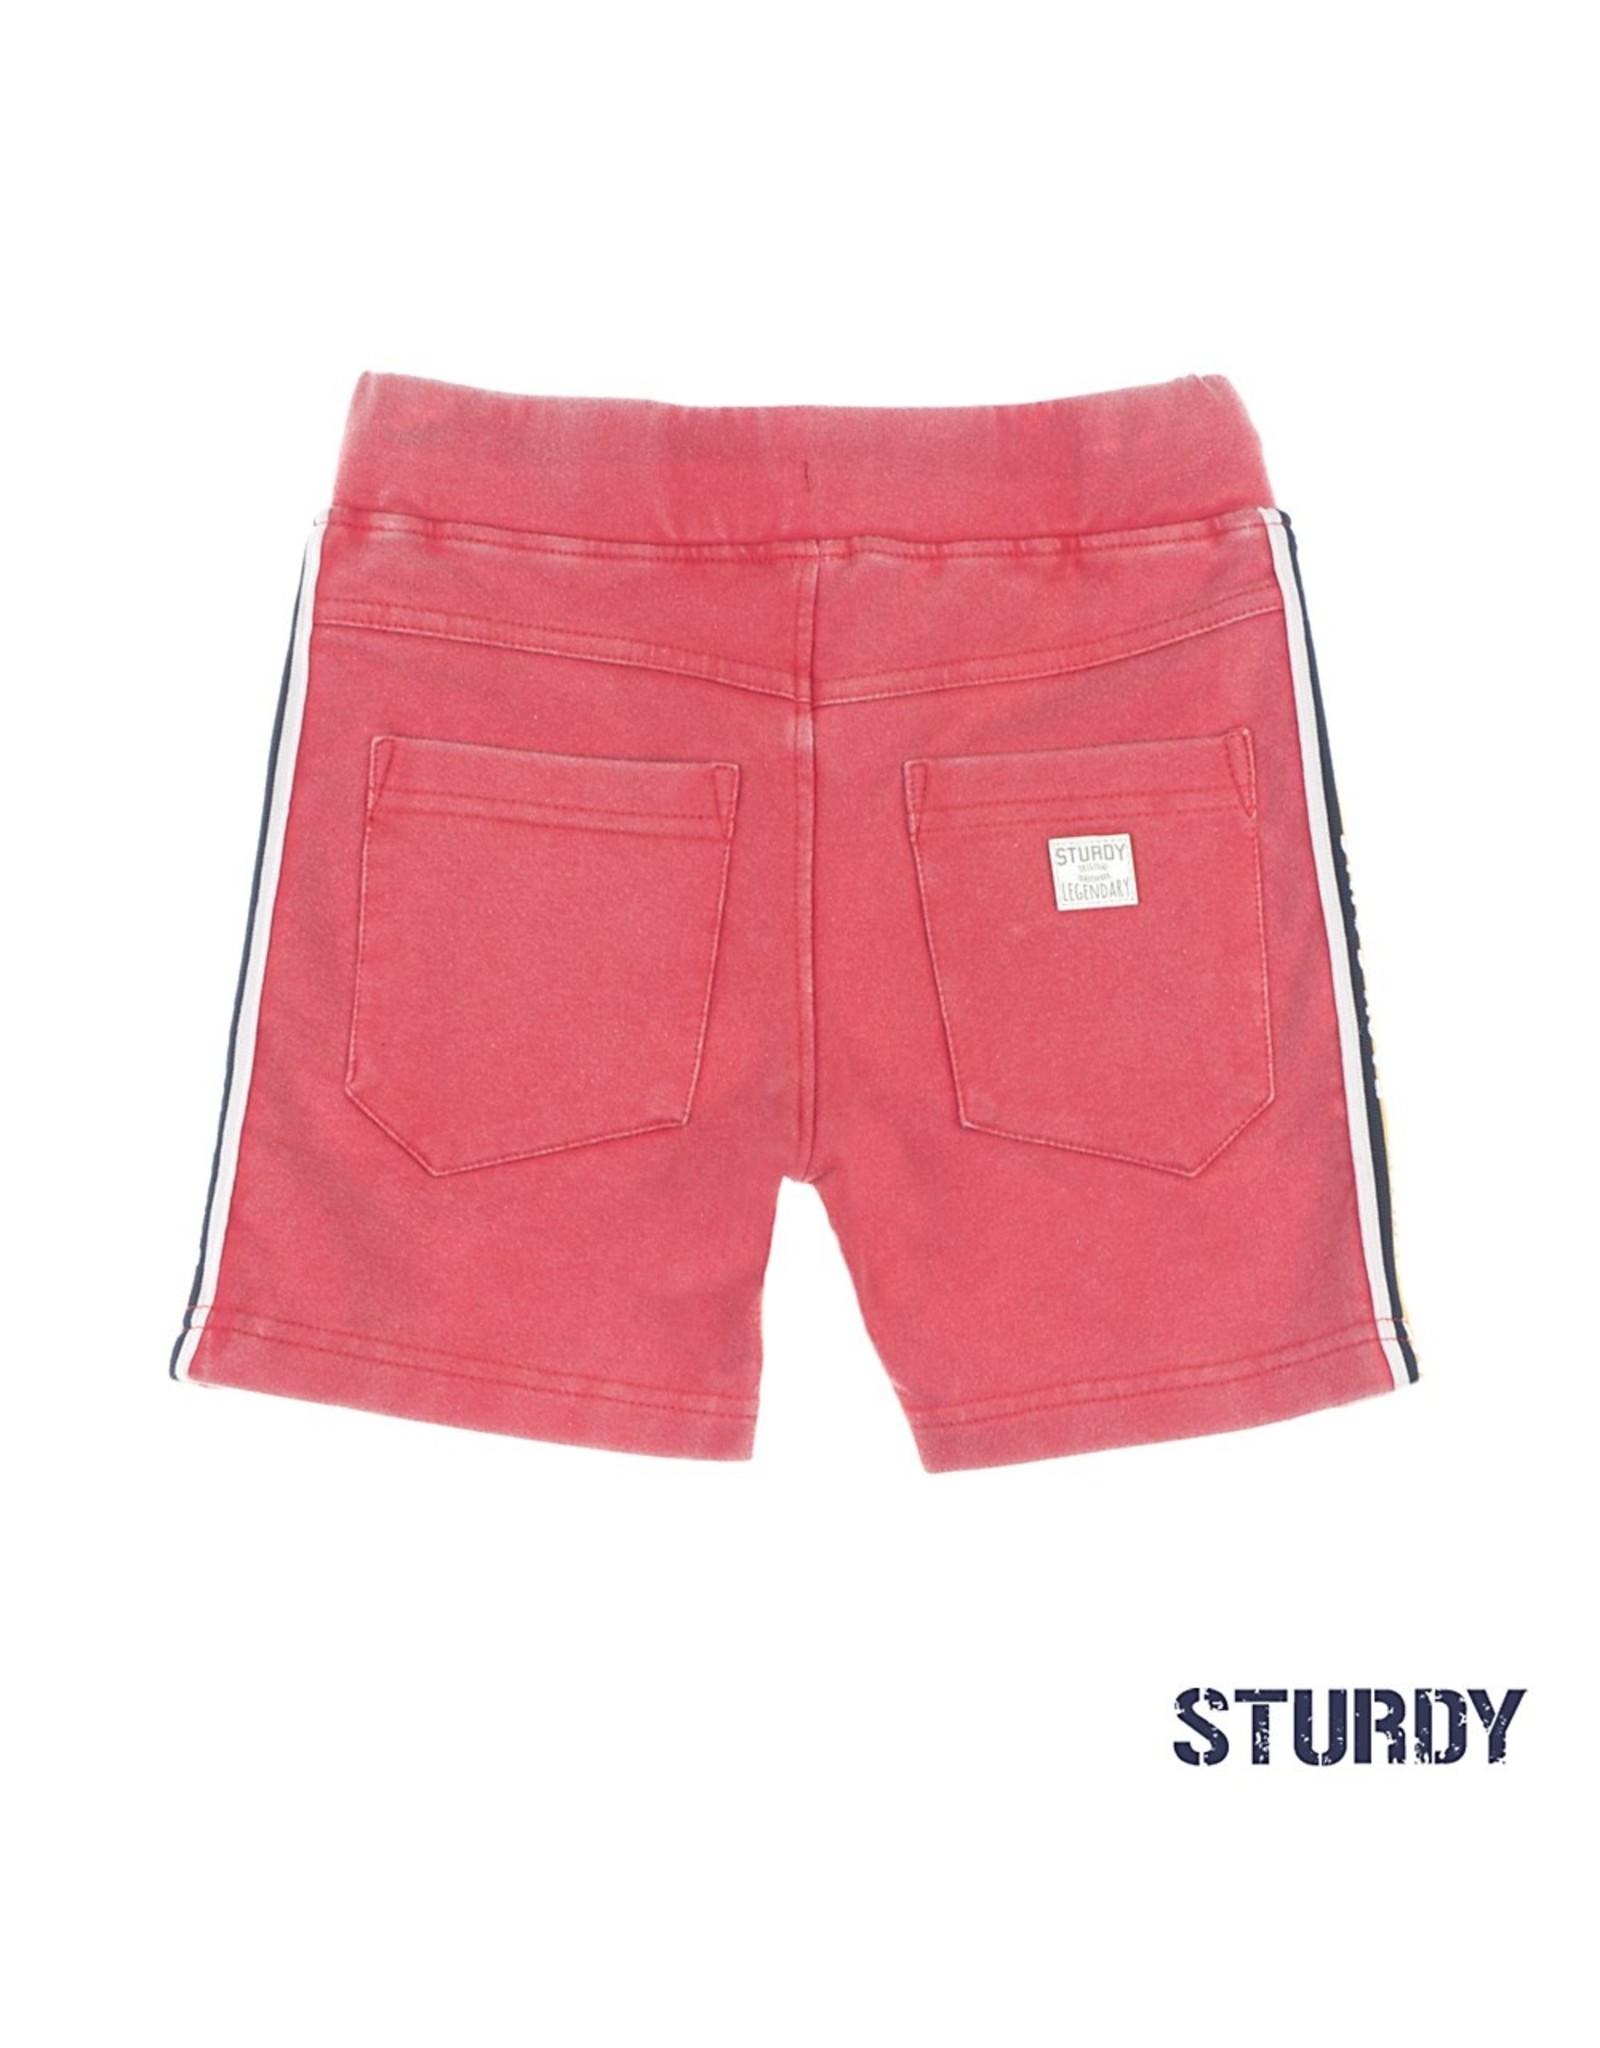 Sturdy Short - Thrillseeker rood maat 110